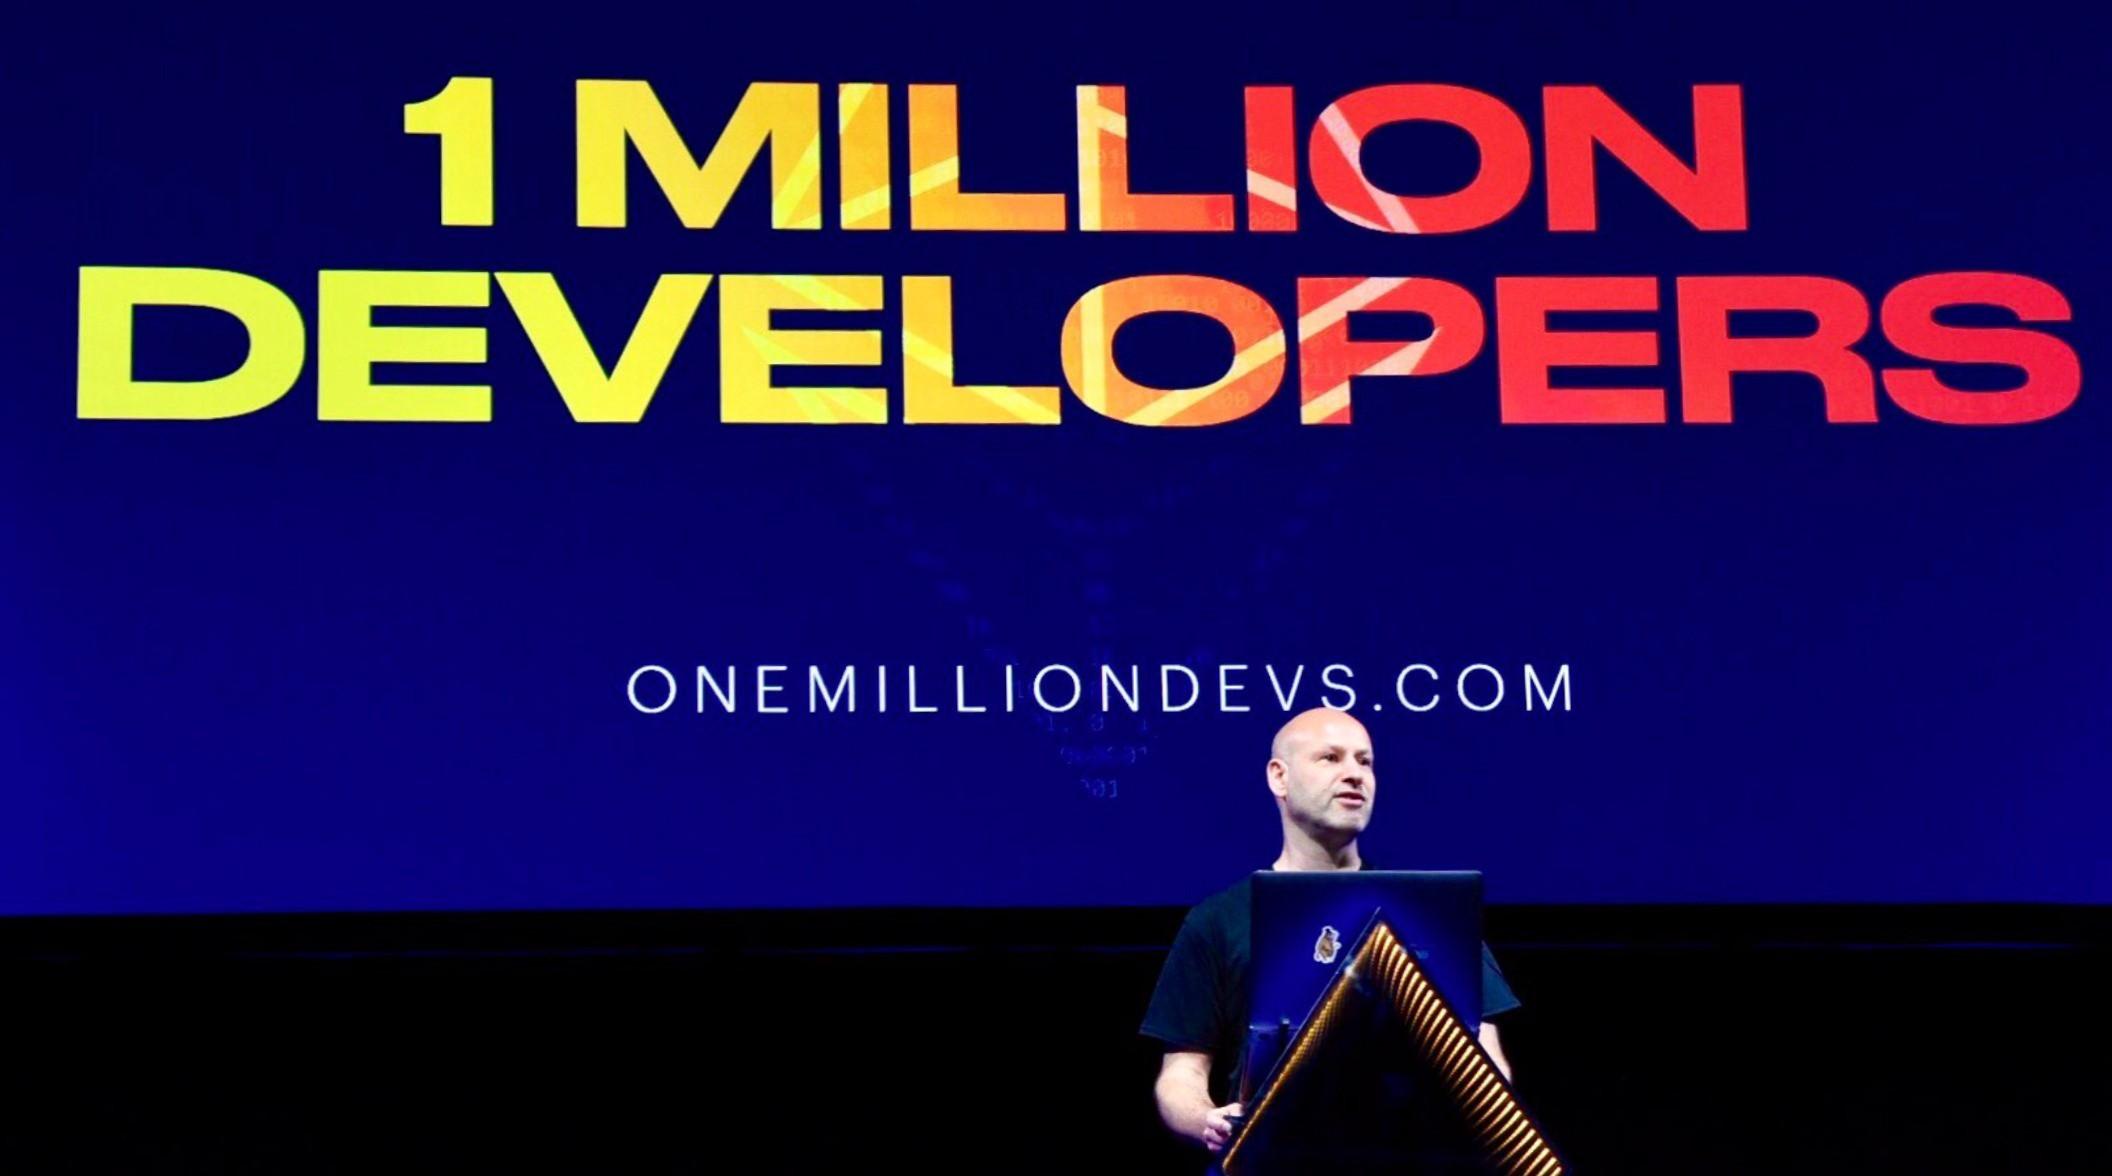 1 million developers